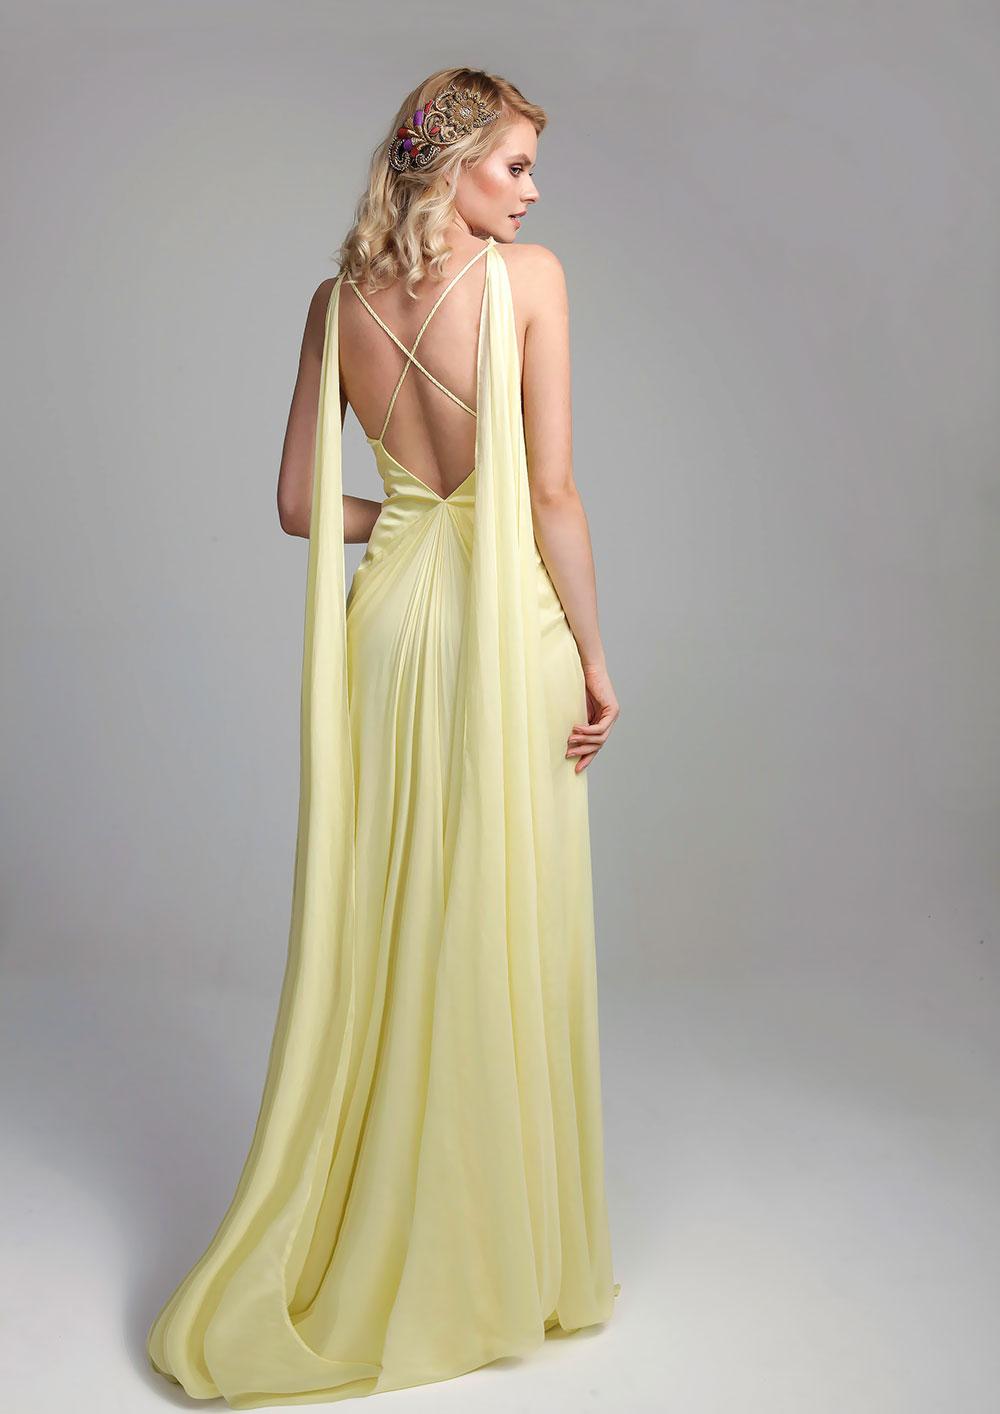 Dorothy Milk gown